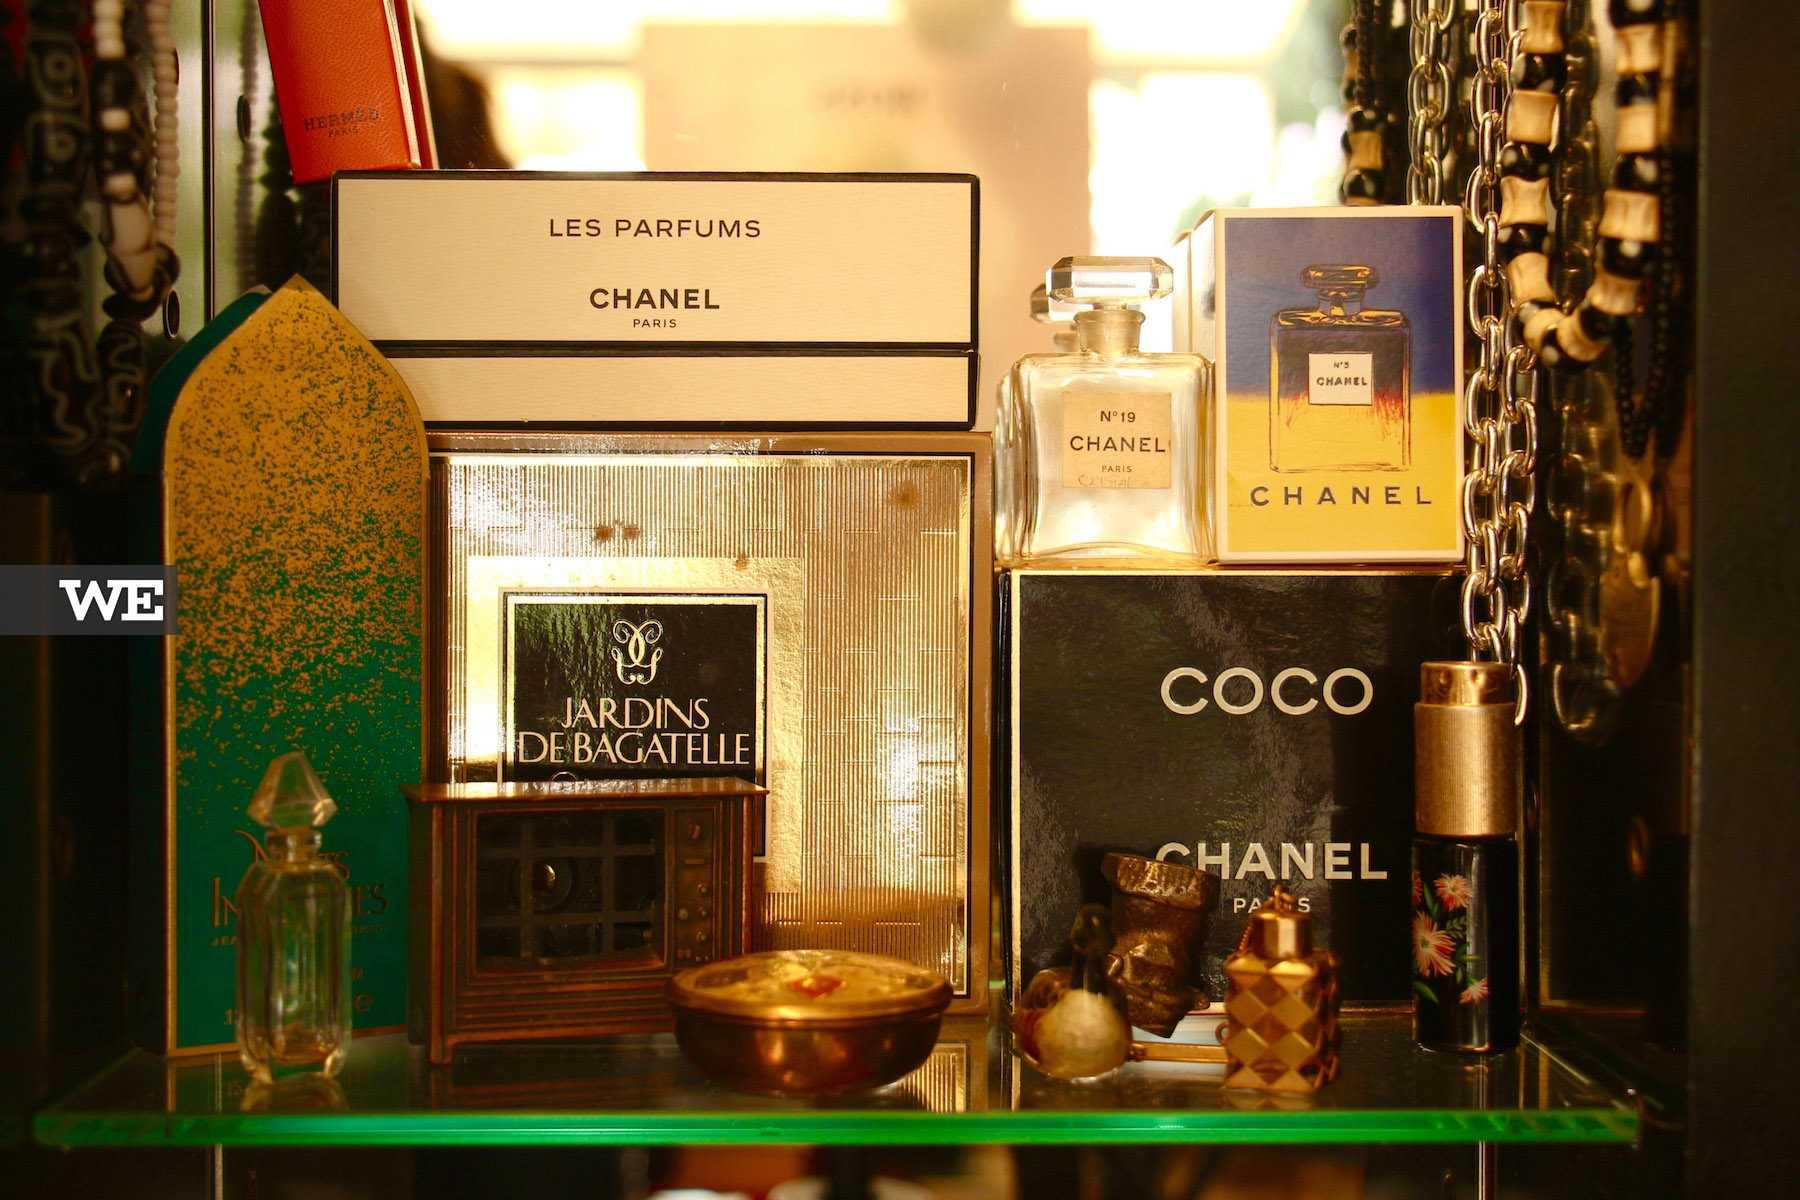 Miniaturas e réplicas de perfumes na Visage Perfumaria